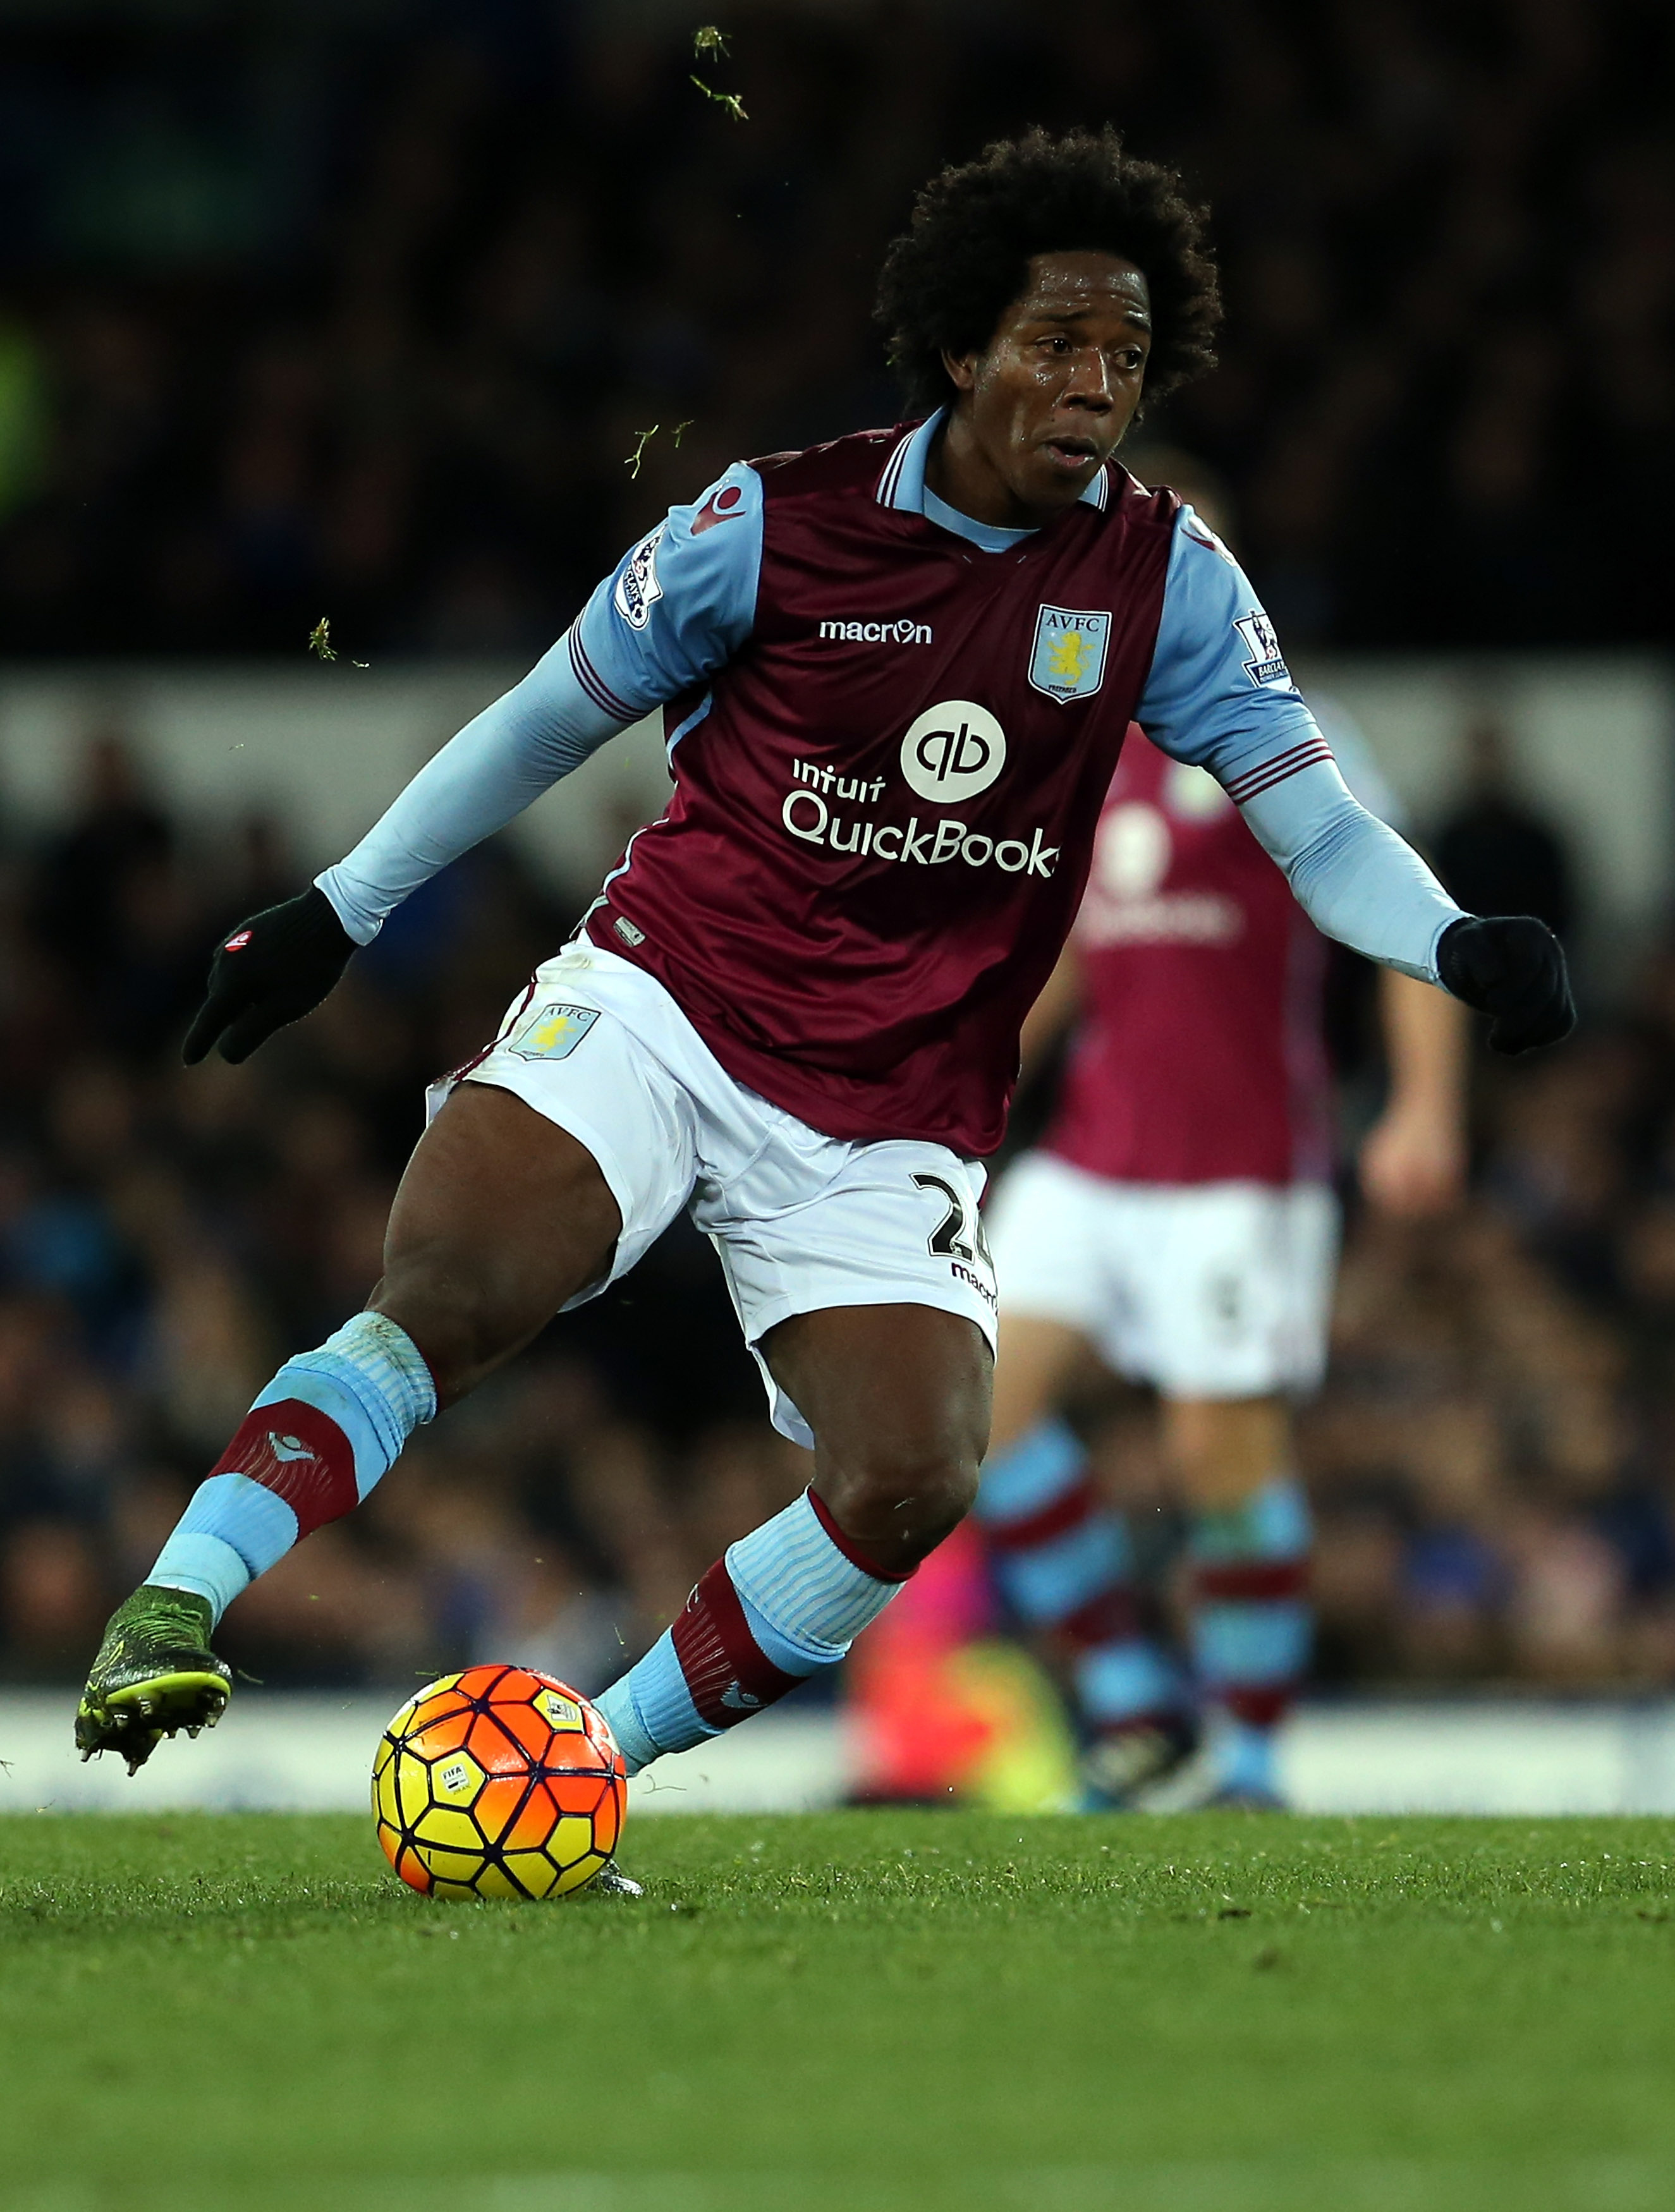 Carlos Sánchez could be the key man for Aston Villa